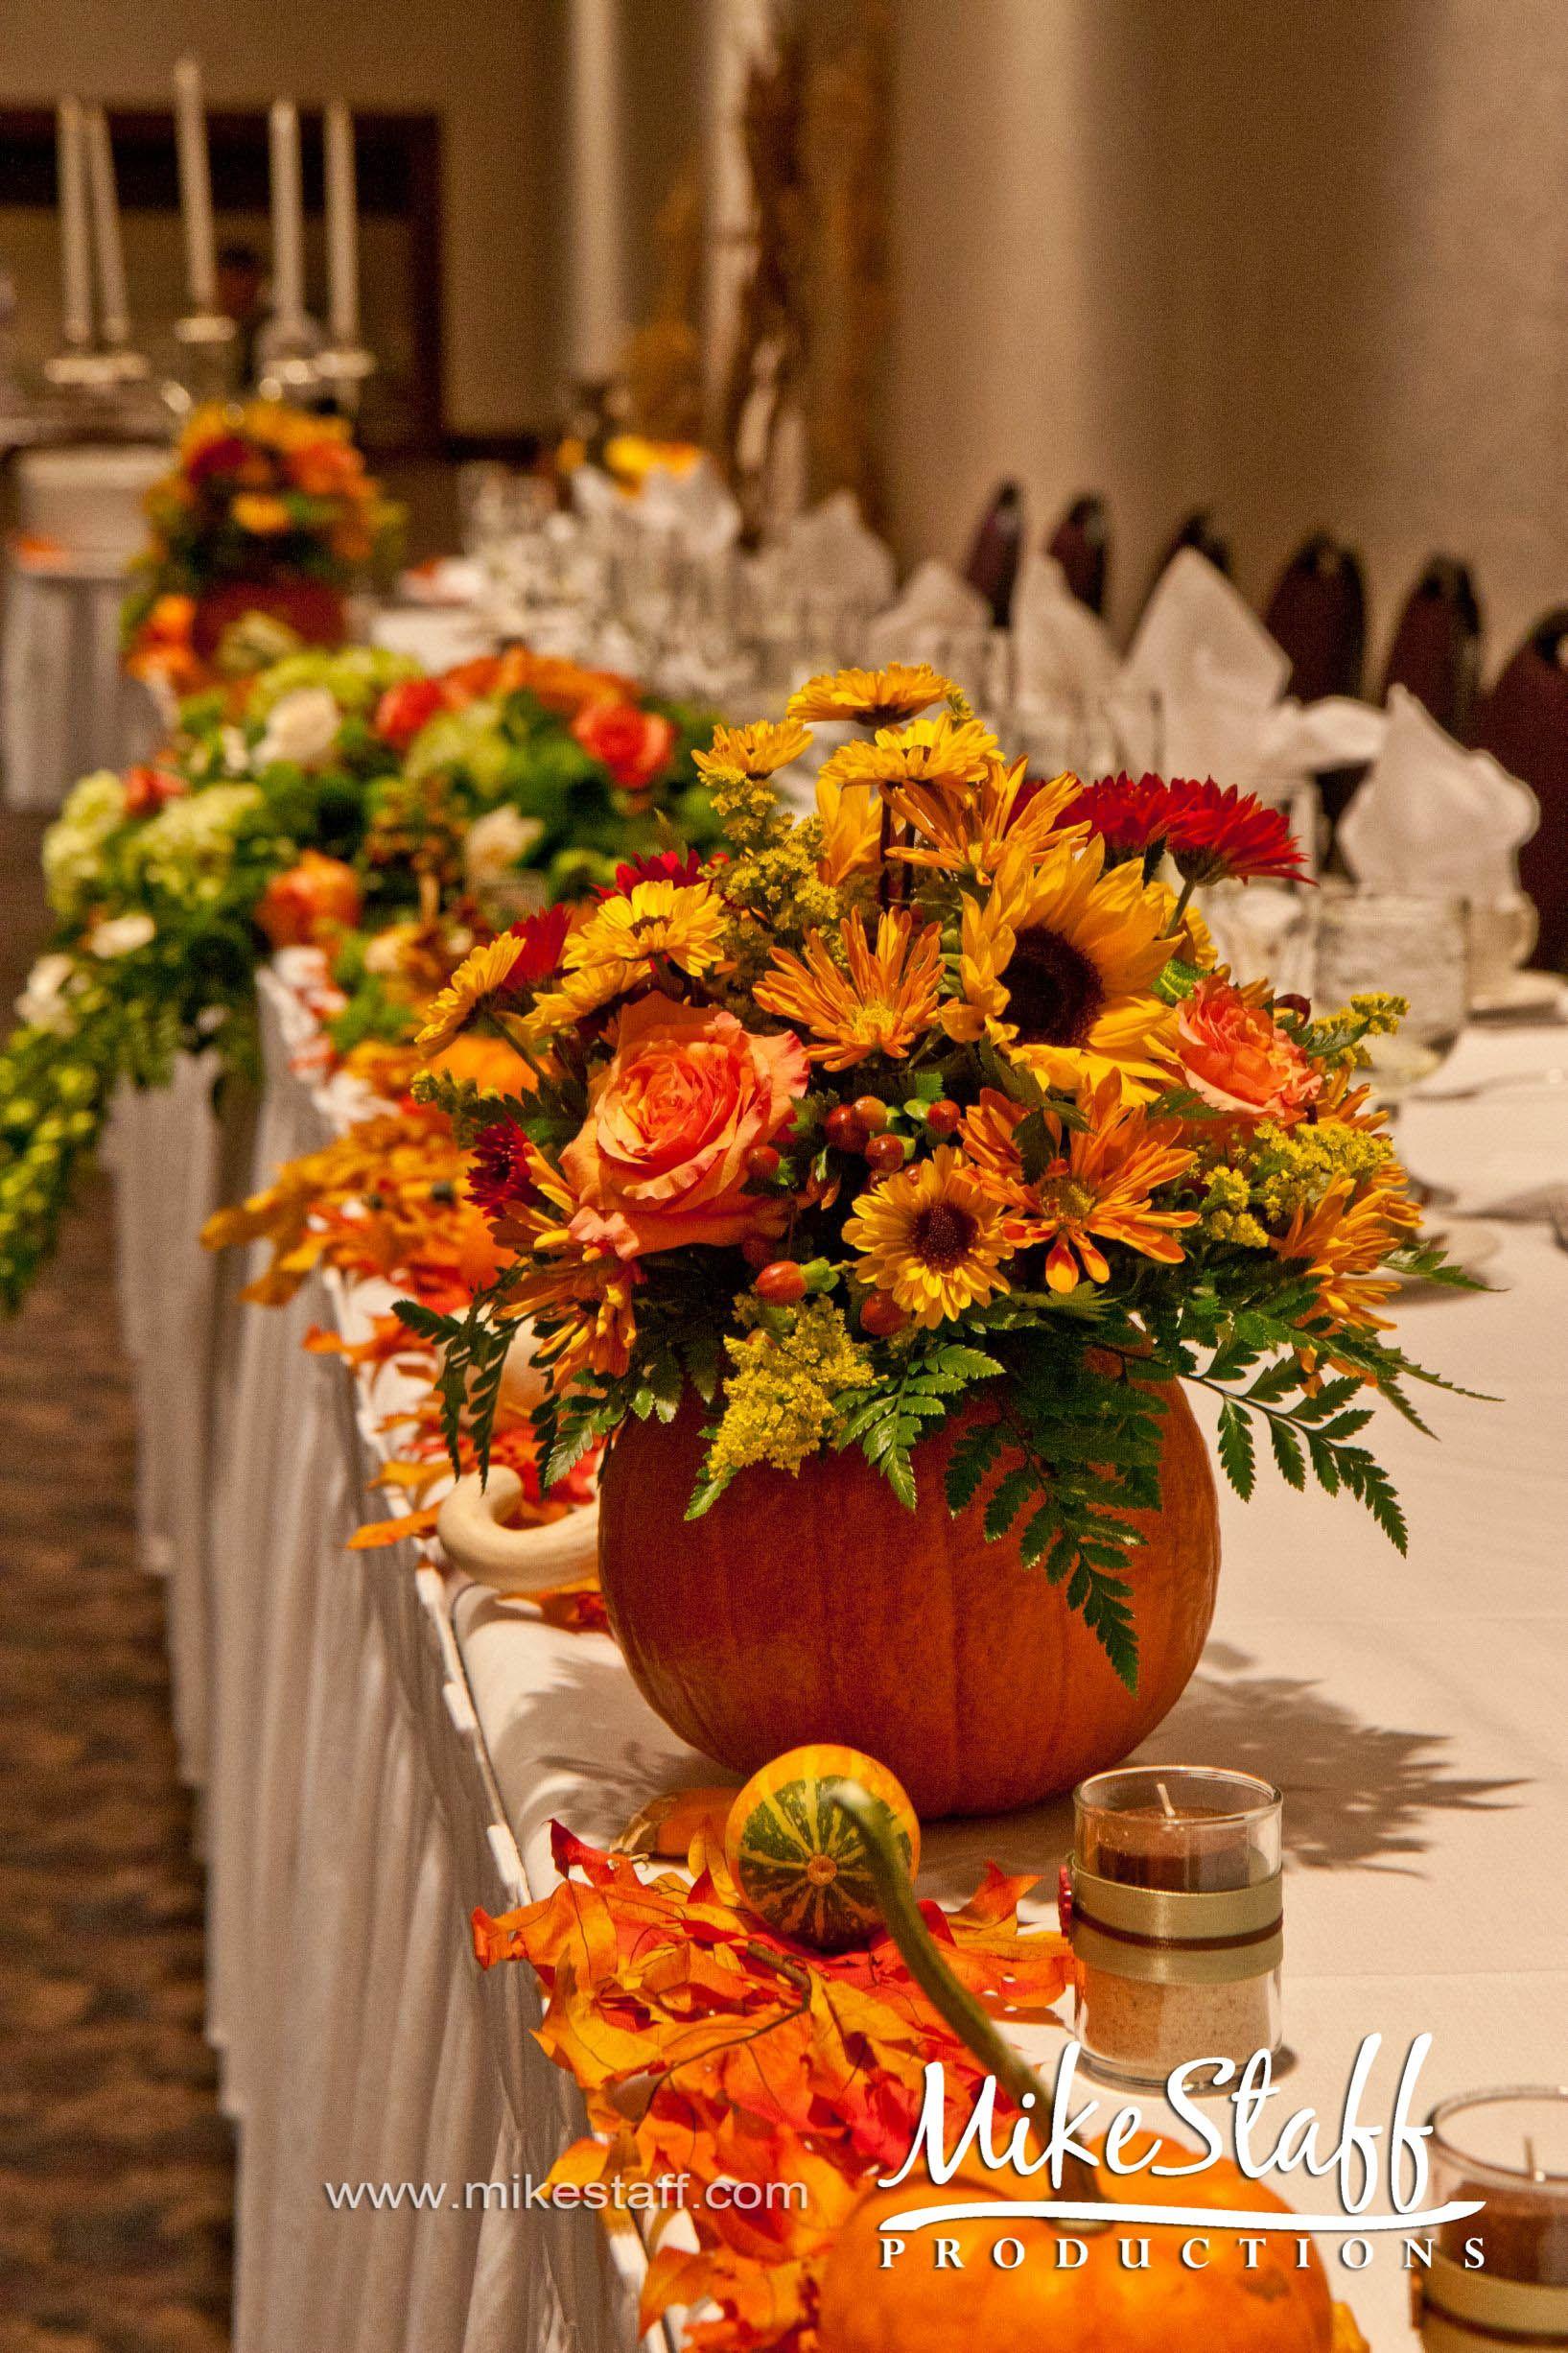 Wedding Reception Centerpieces Fall Centerpieces Pinterest